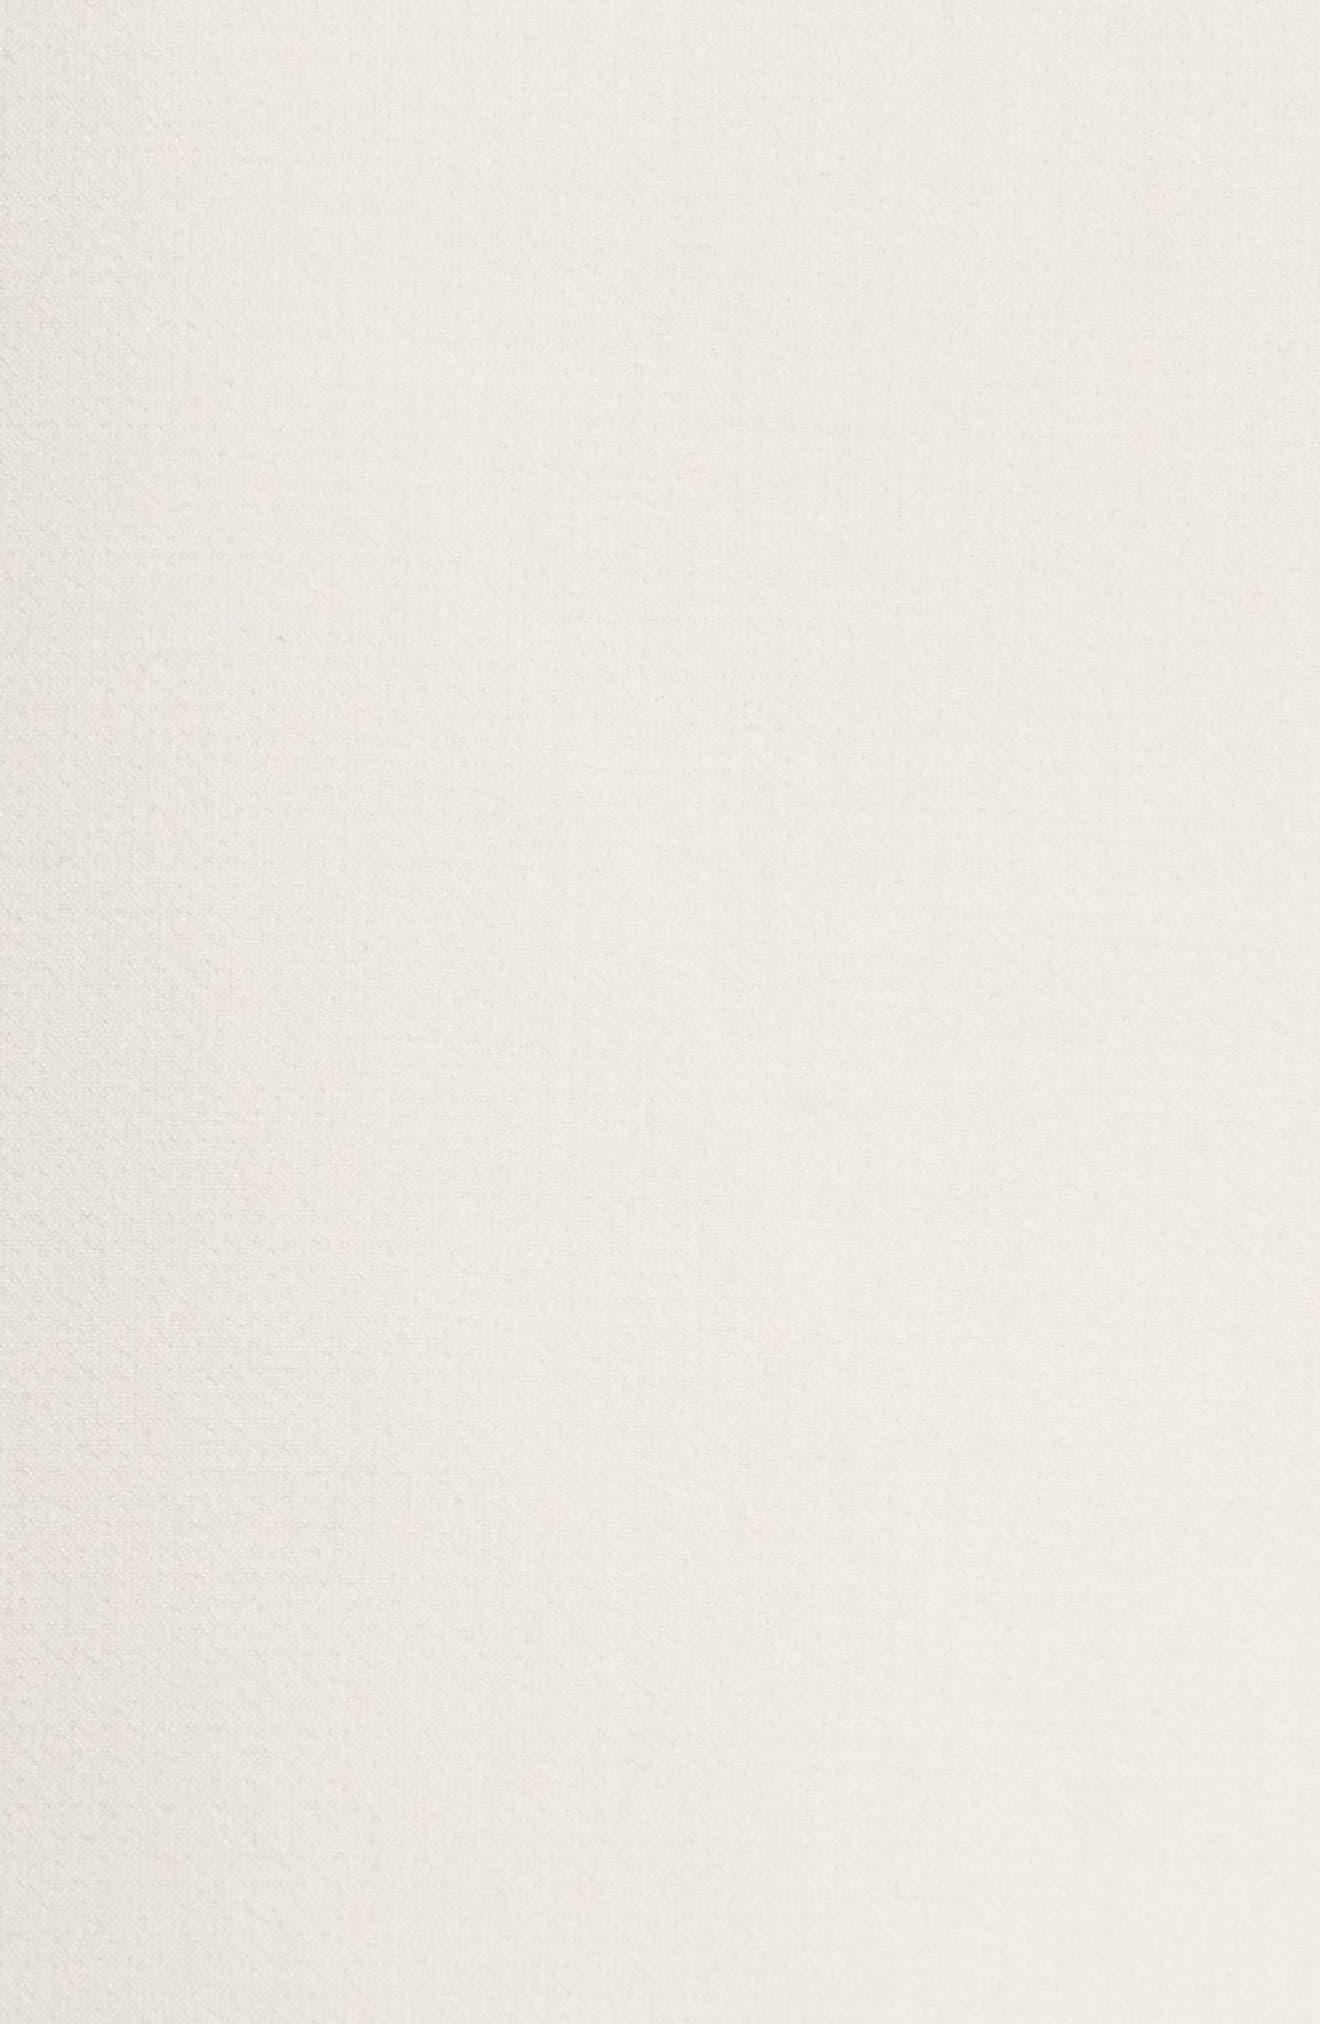 Armani Jeans Crepe Wrap Skirt,                             Alternate thumbnail 5, color,                             Beige